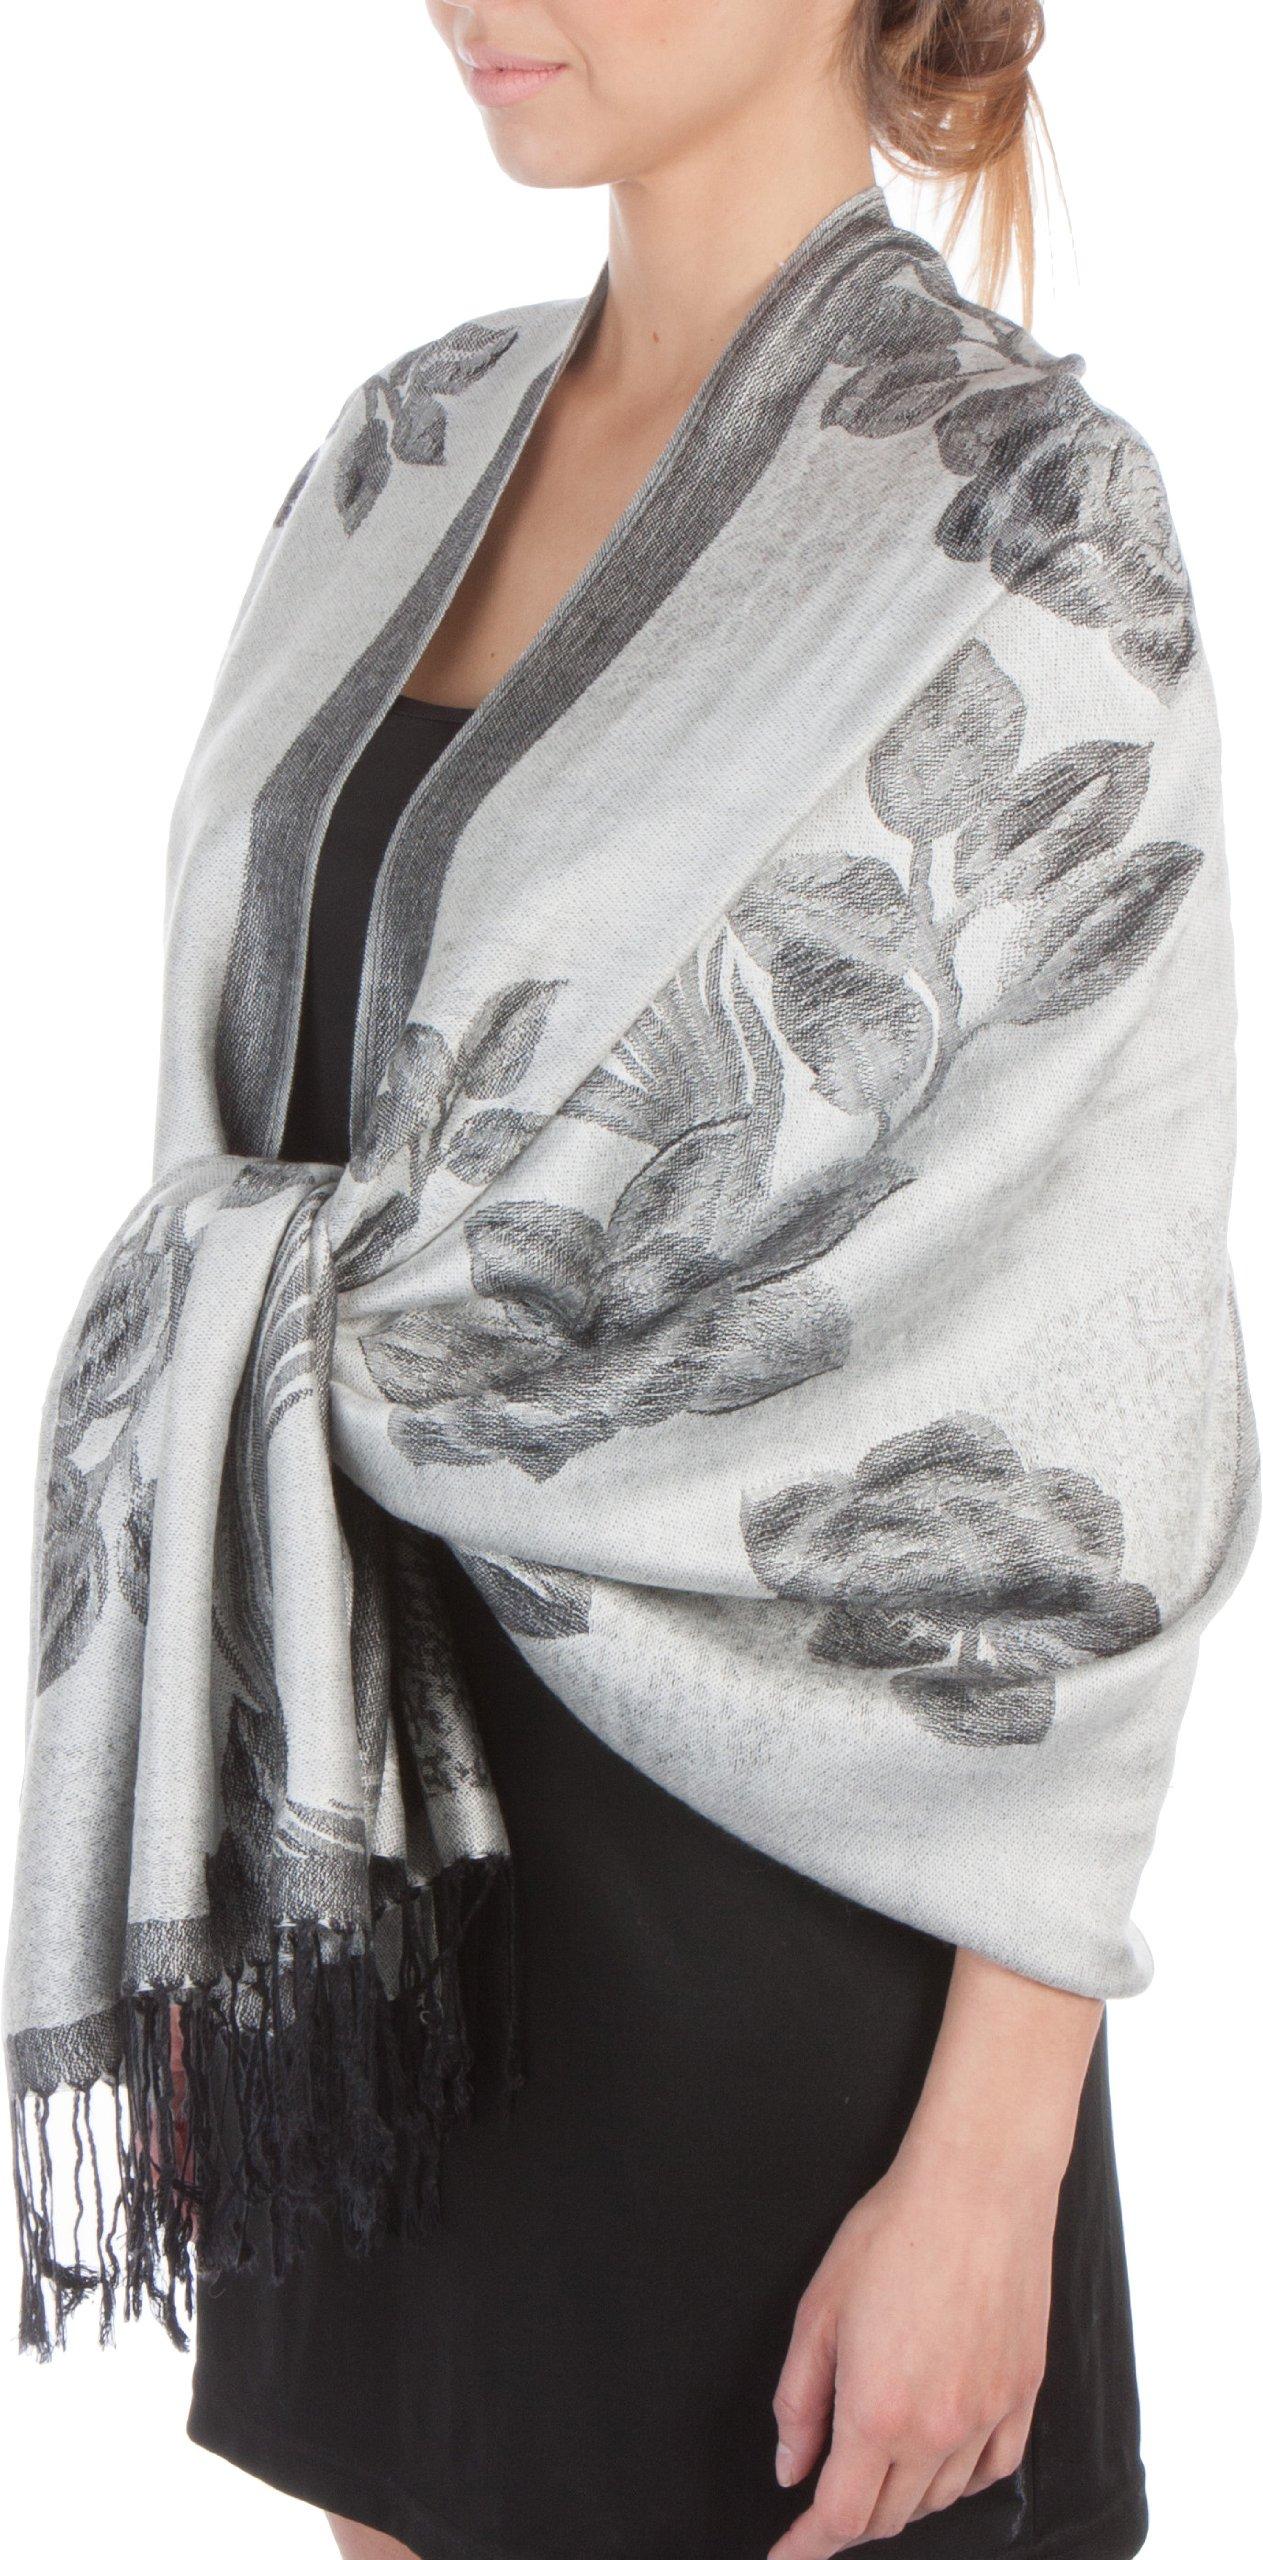 FUPashRose06AG Lightweight Two Tone Rose Floral Design Pashmina Fringe Scarf / Stole / Wrap - White / Black